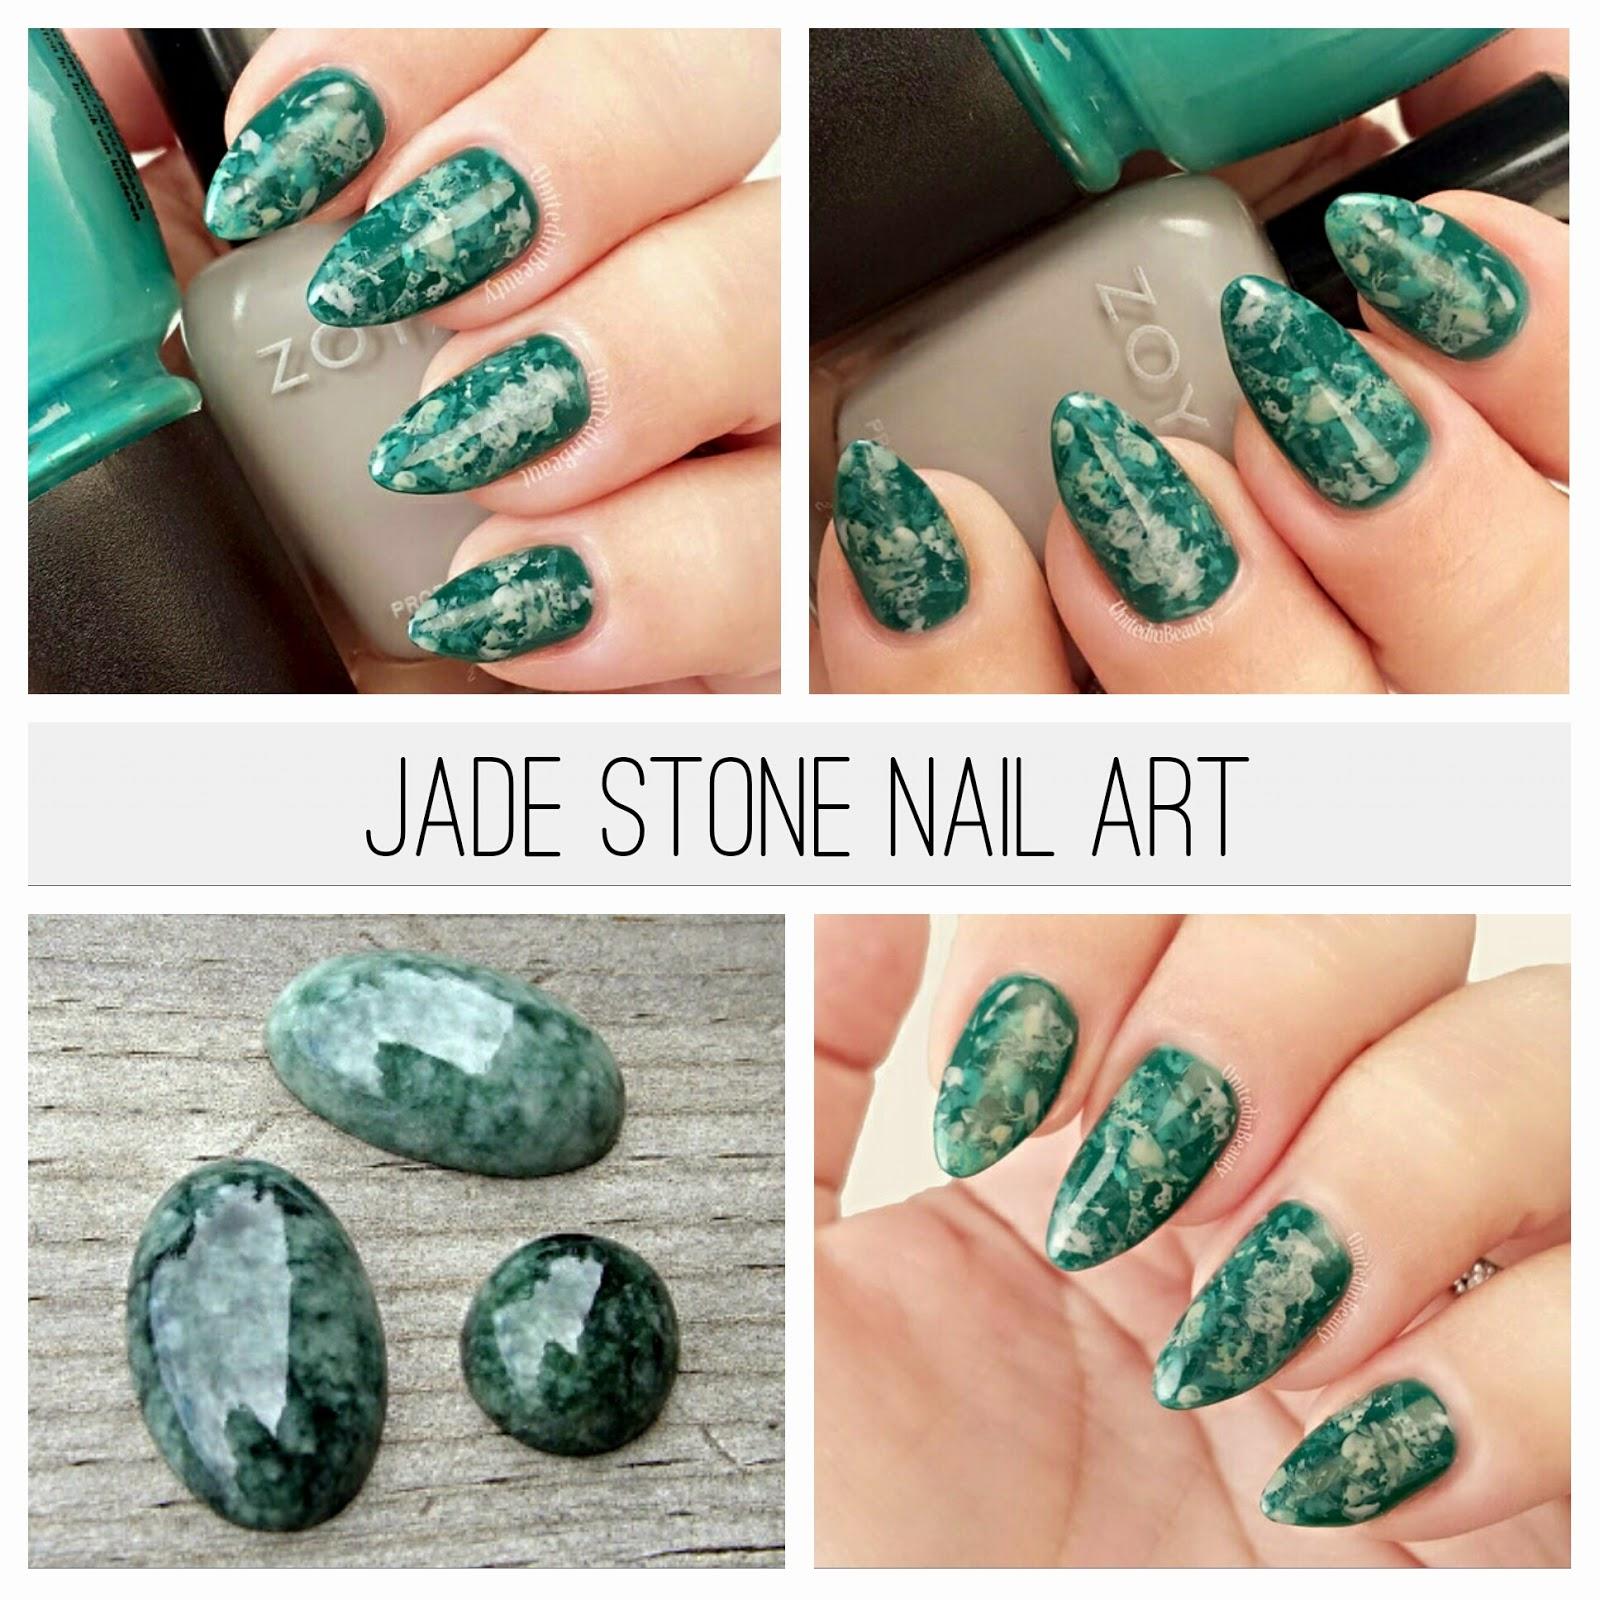 jade stone marble nails by @unitedinbeauty